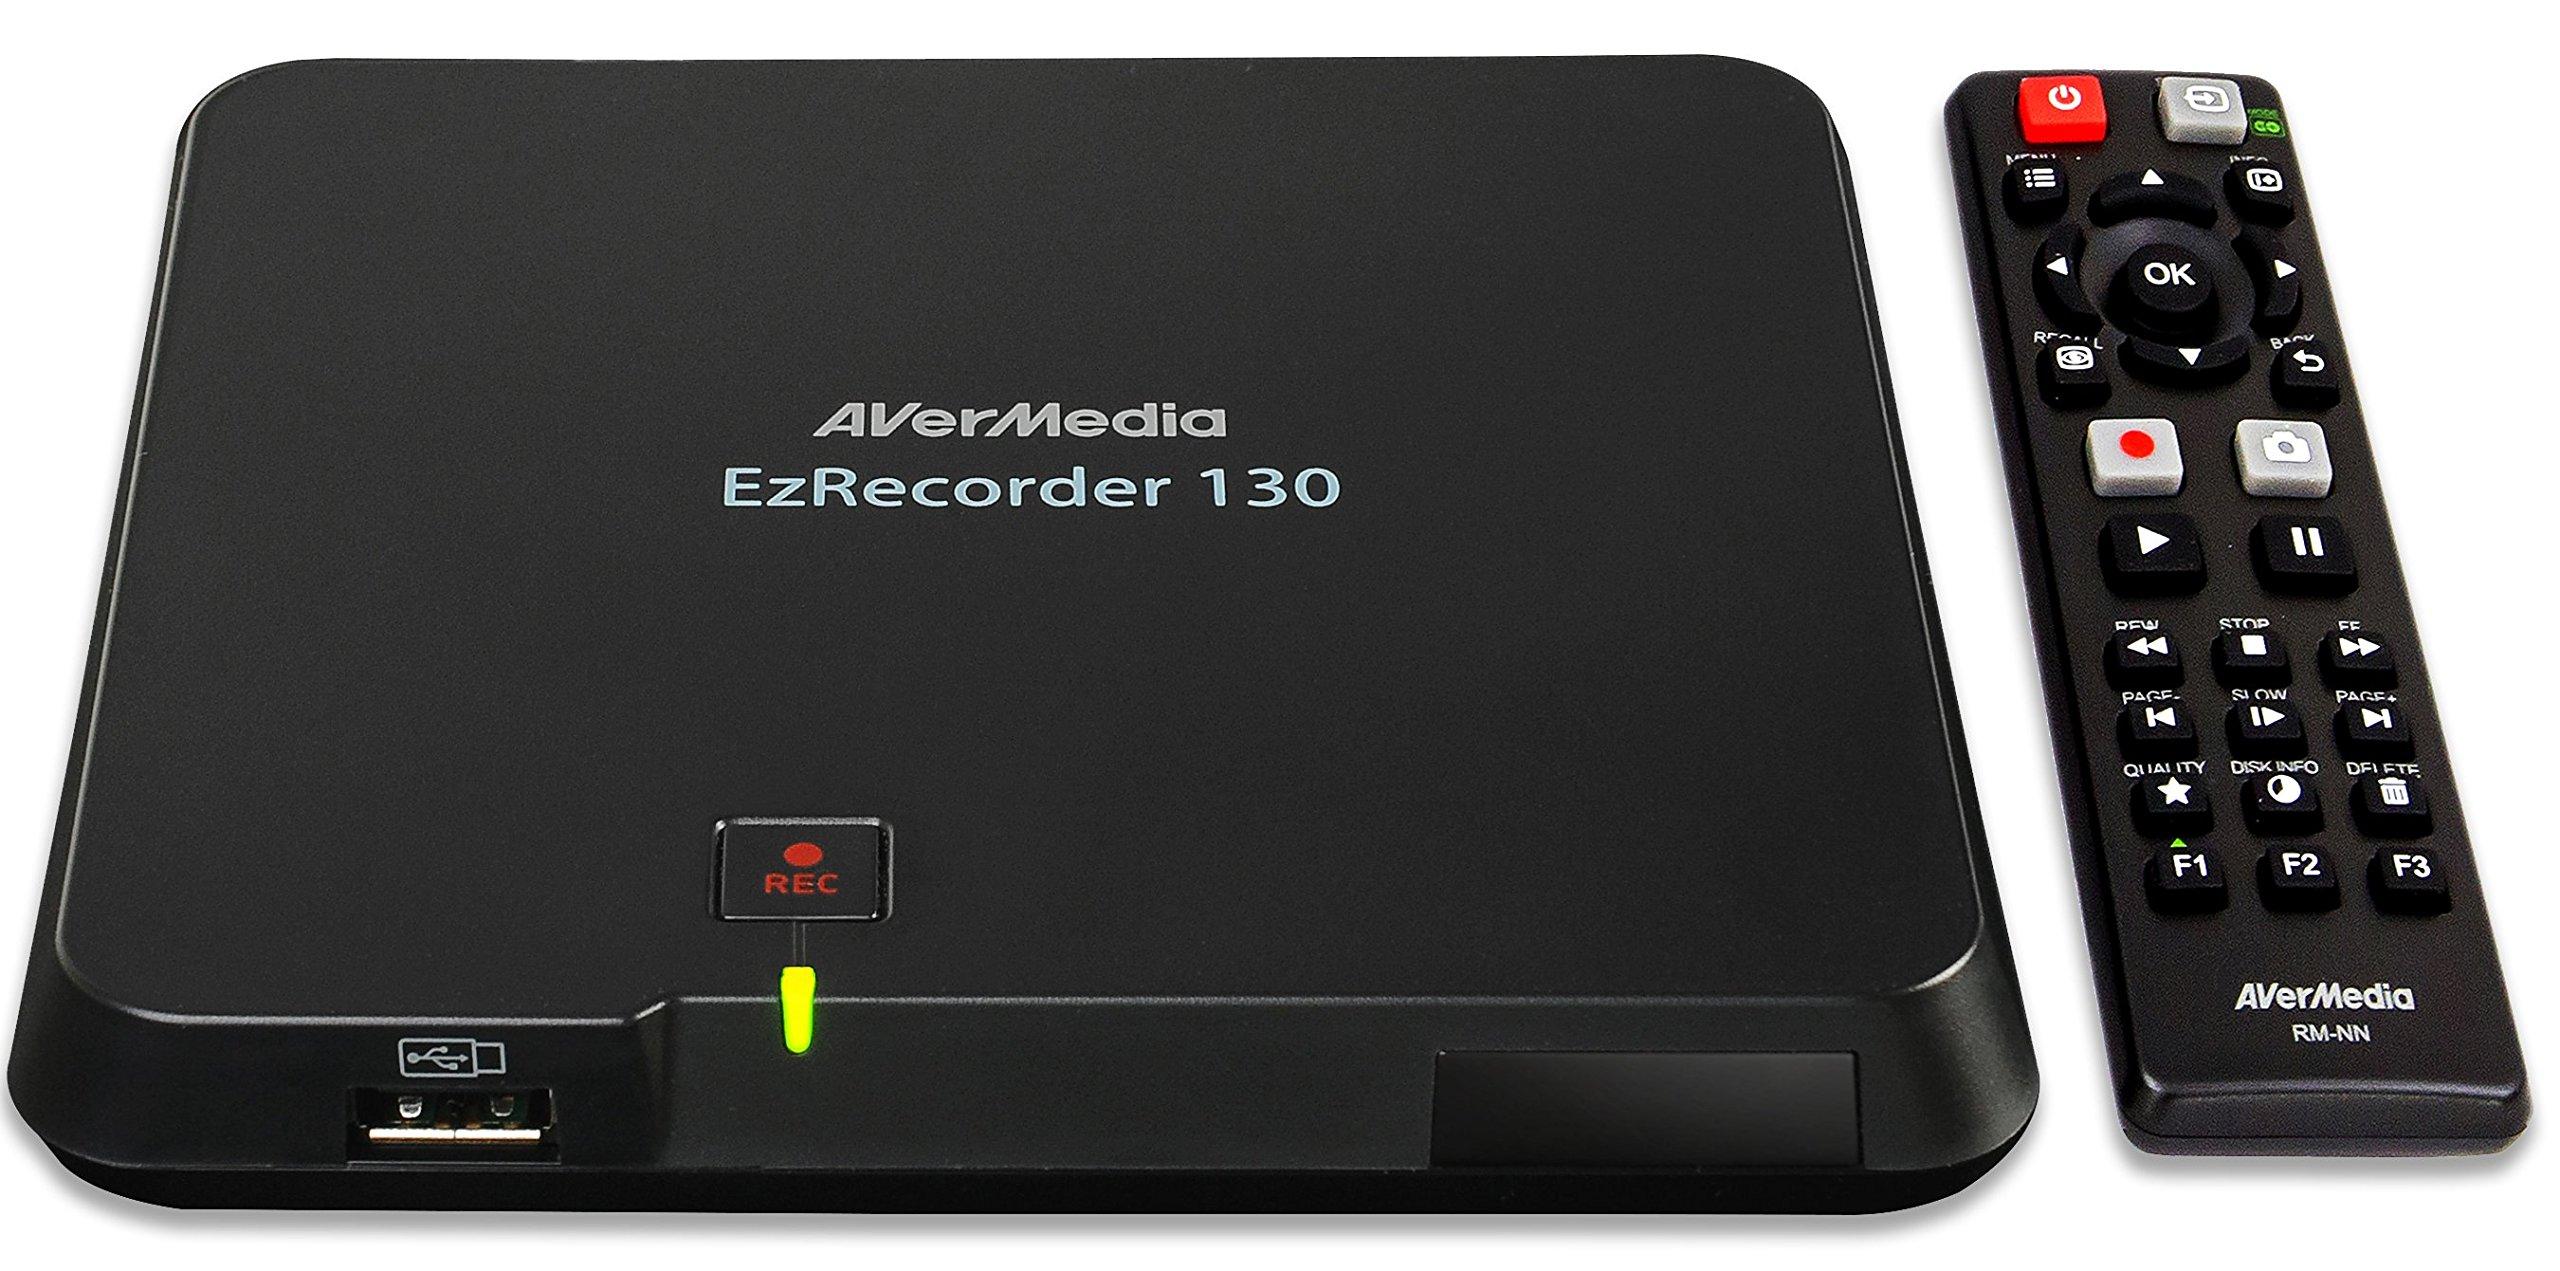 AVerMedia EzRecorder, HD Video Capture High Definition HDMI Recorder, PVR, DVR, Schedule Recording, 32GB Flash Drive Incl  (ER130) by AVerMedia